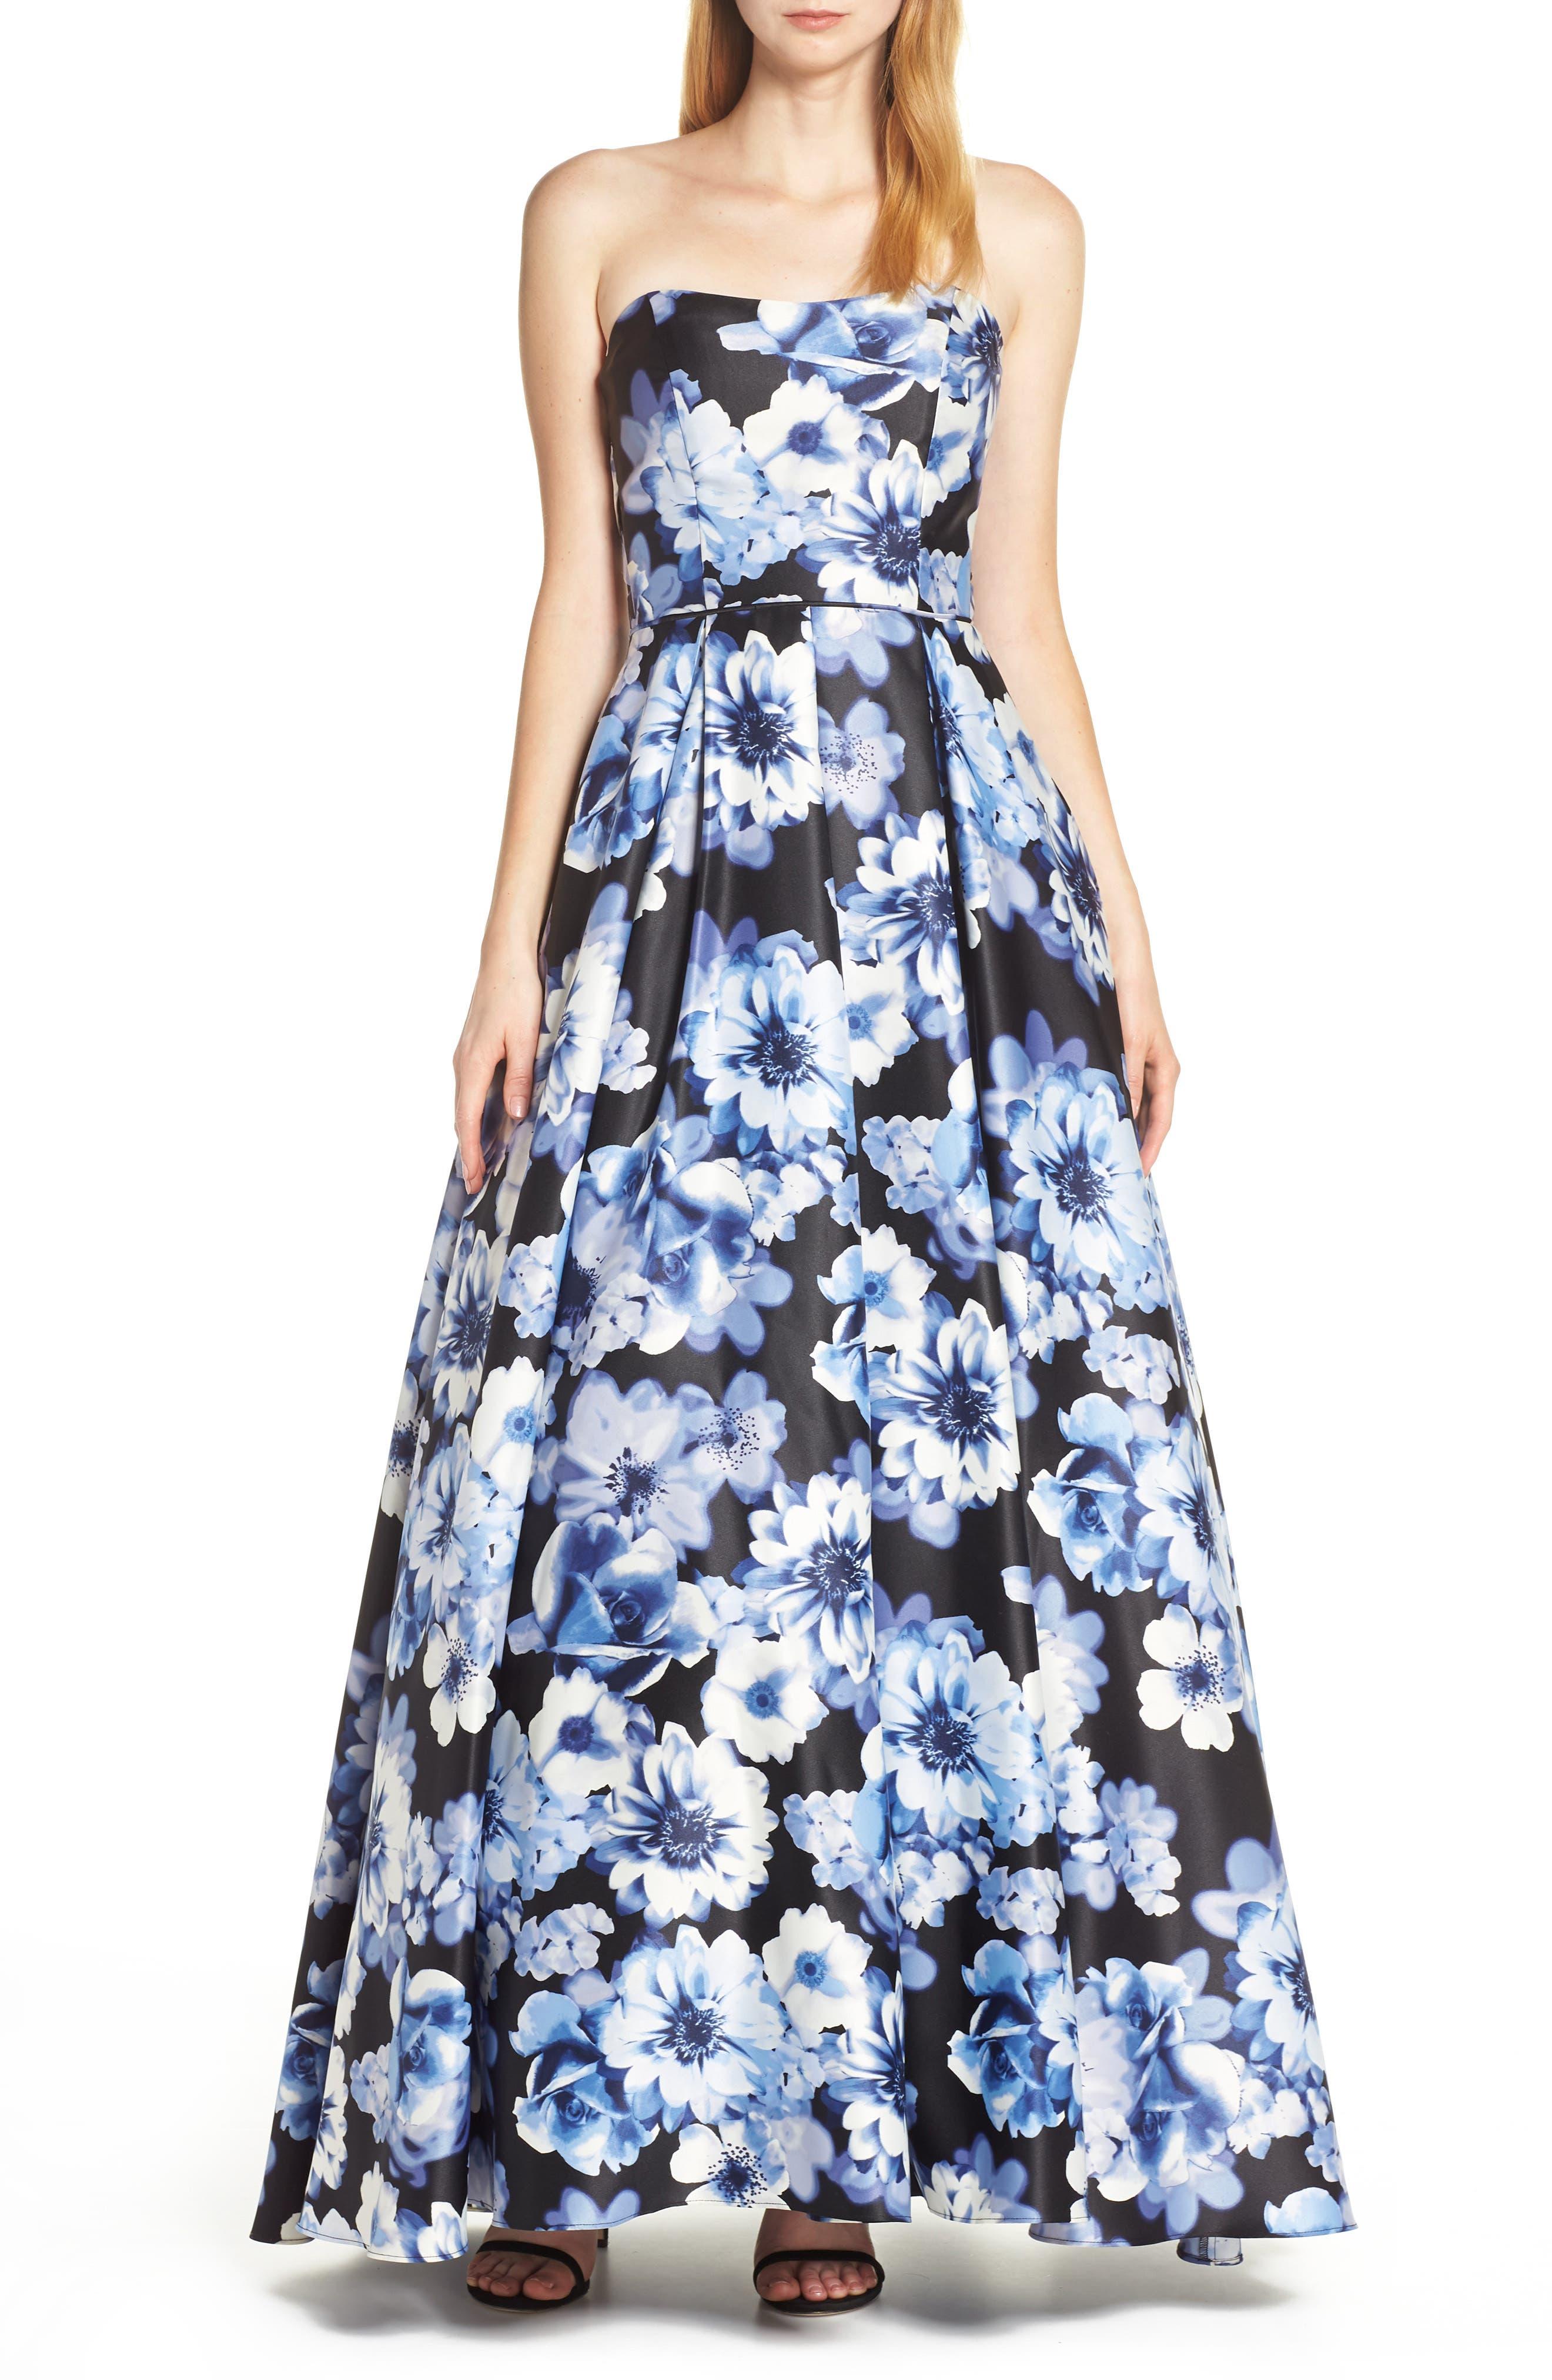 Blondie Nites Floral Print Strapless Satin Evening Dress, Blue